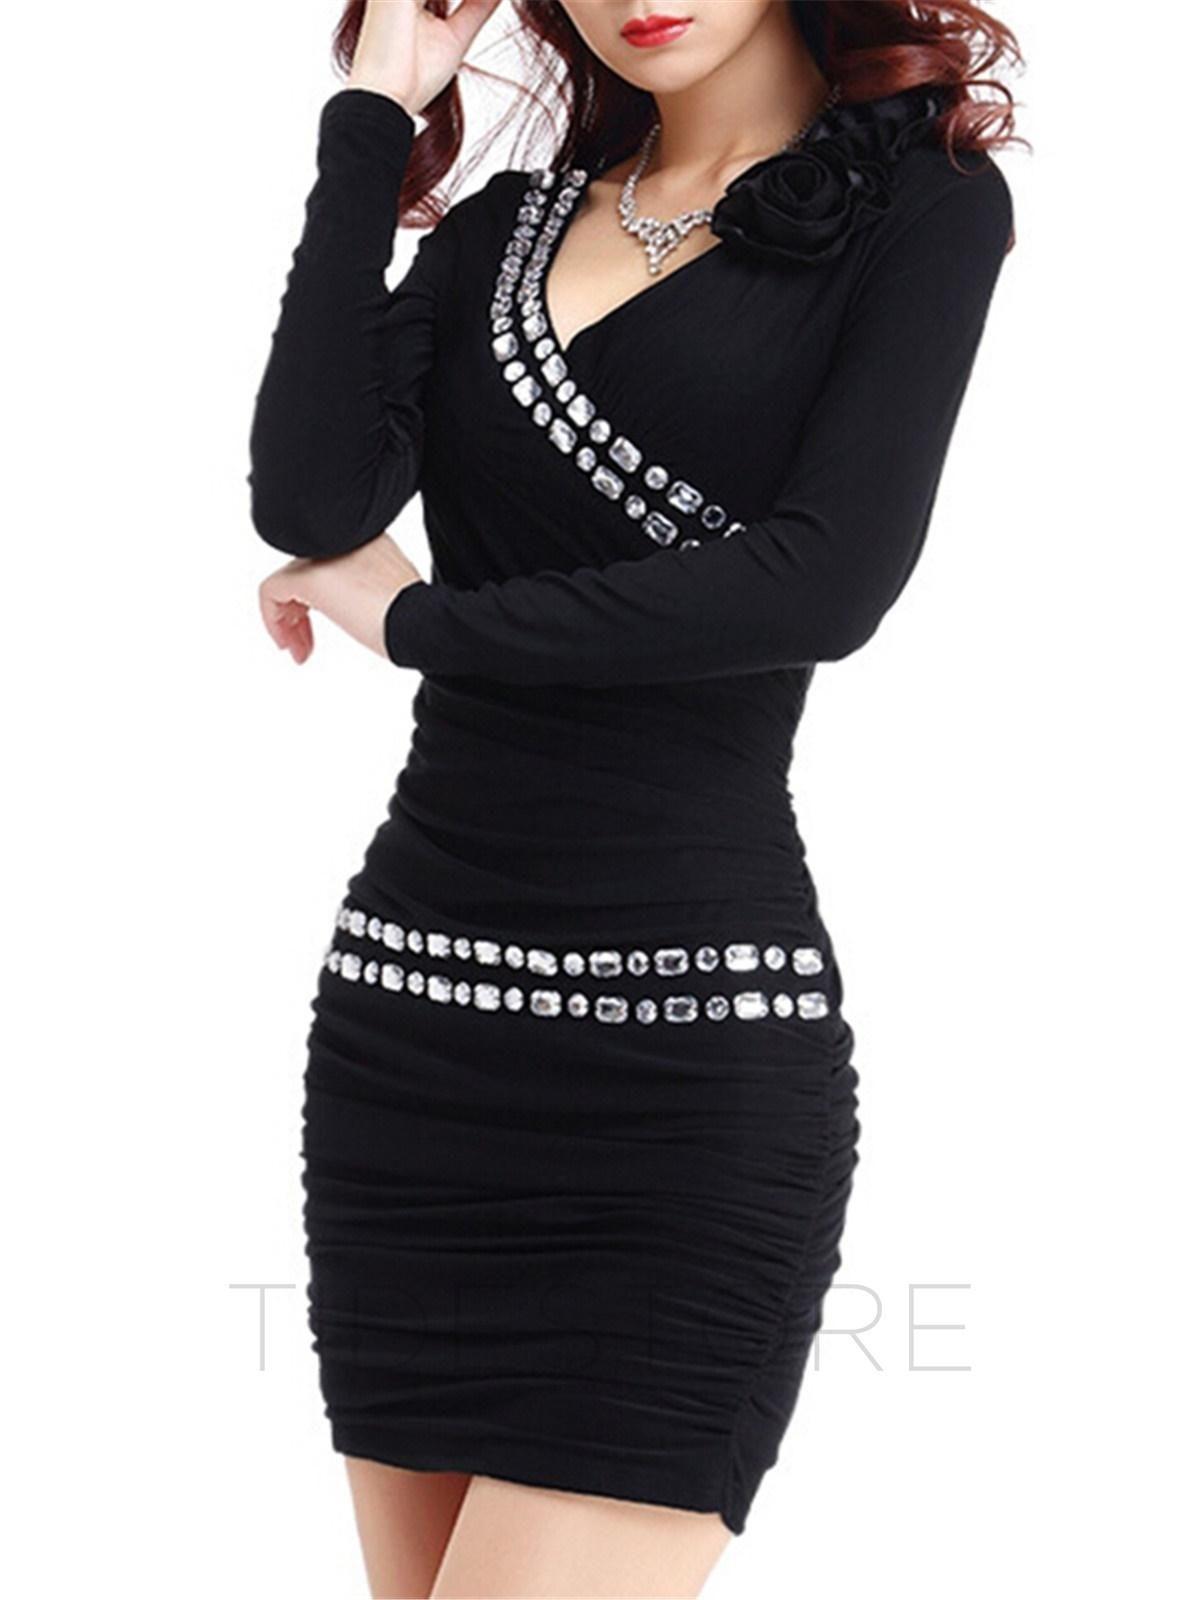 Tidestore tidestore fashion solid color v neck long sleeve bodycon